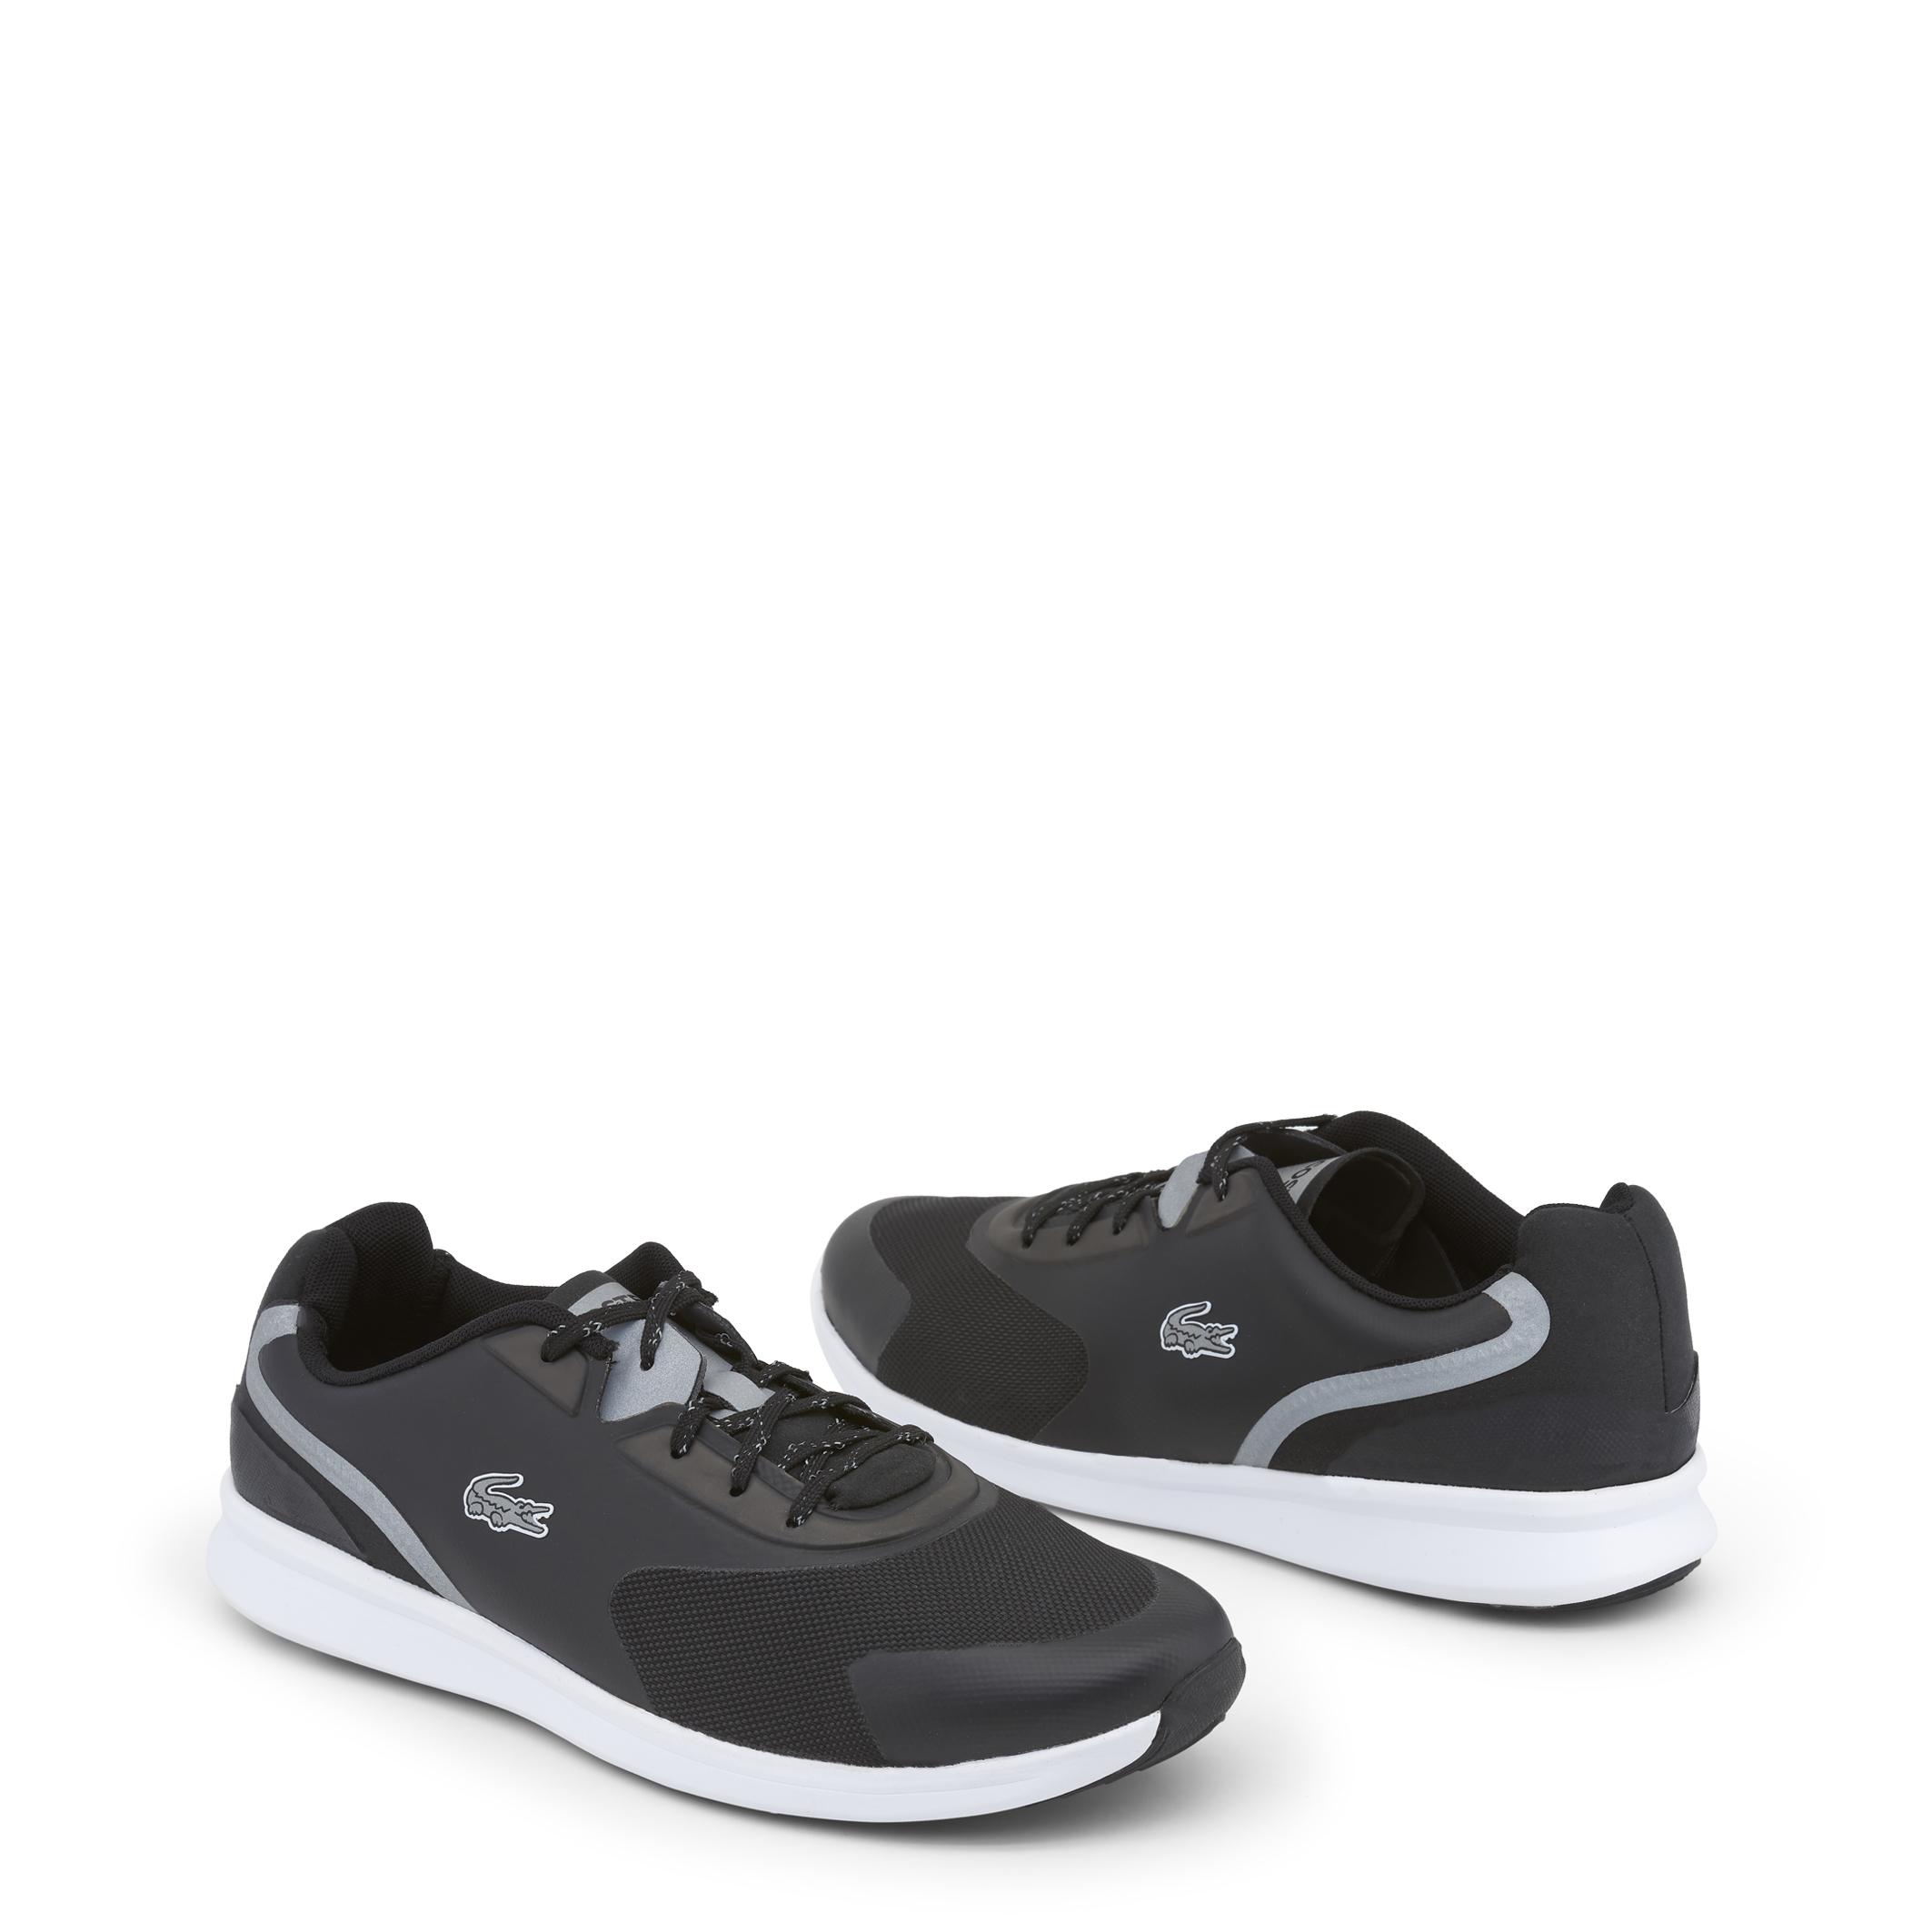 ltr Schwarz Sneakers Men Lacoste 734spm0032 qFwtp